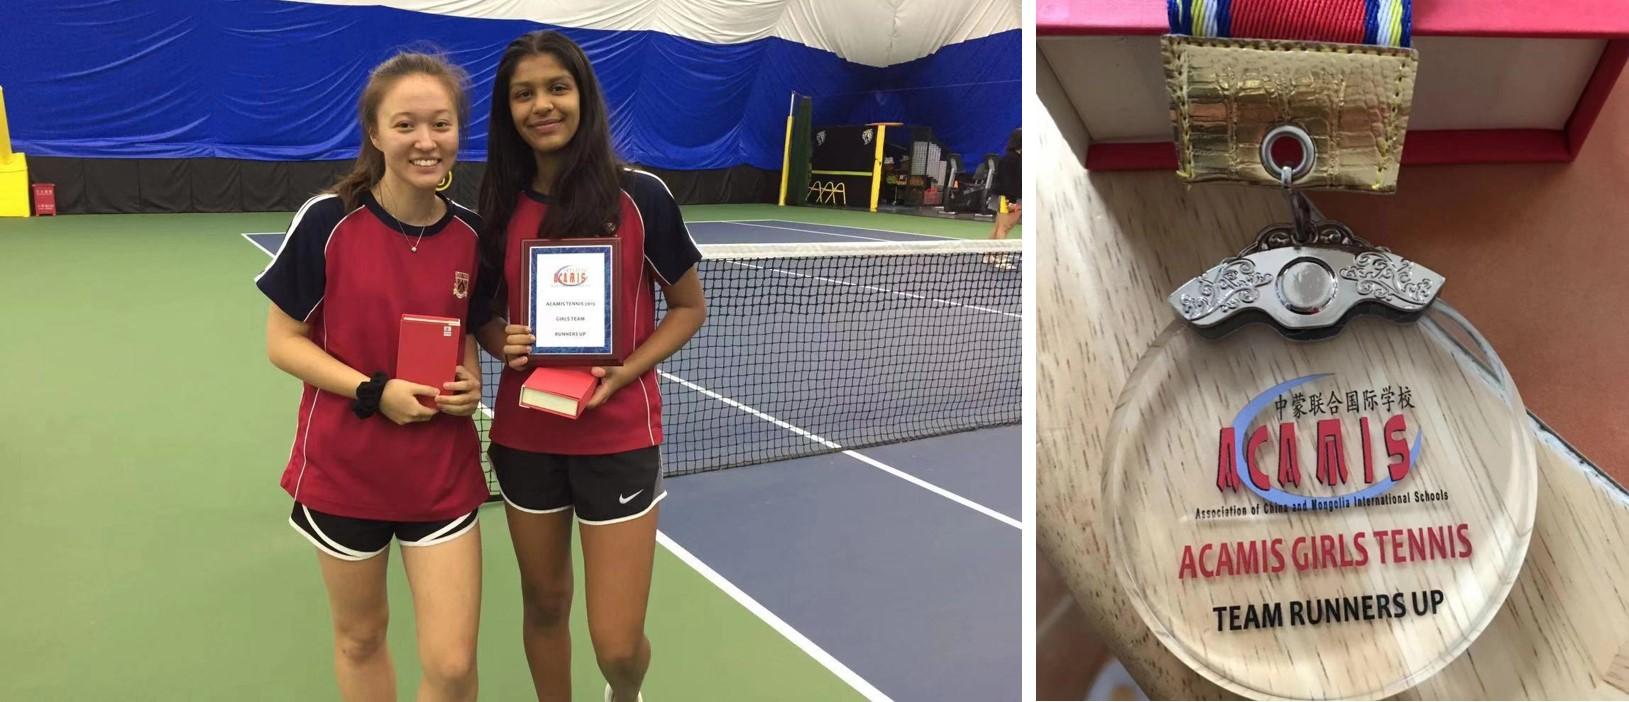 Dulwich U19 tennis players at ACAMIS Tennis Tournament